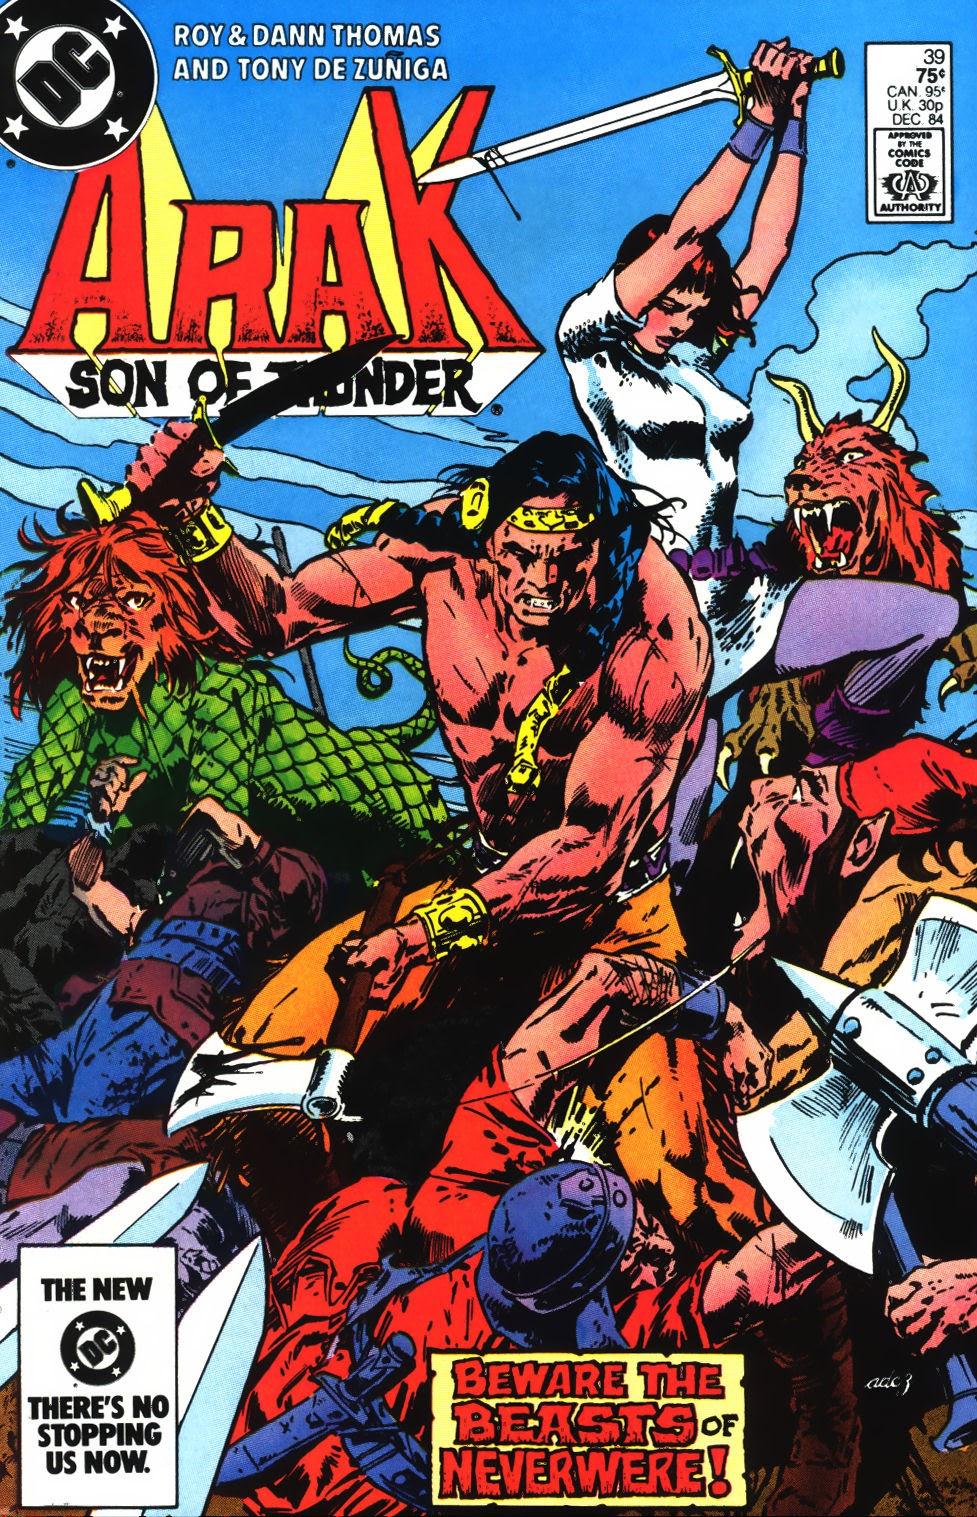 Arak Son of Thunder 39 Page 1